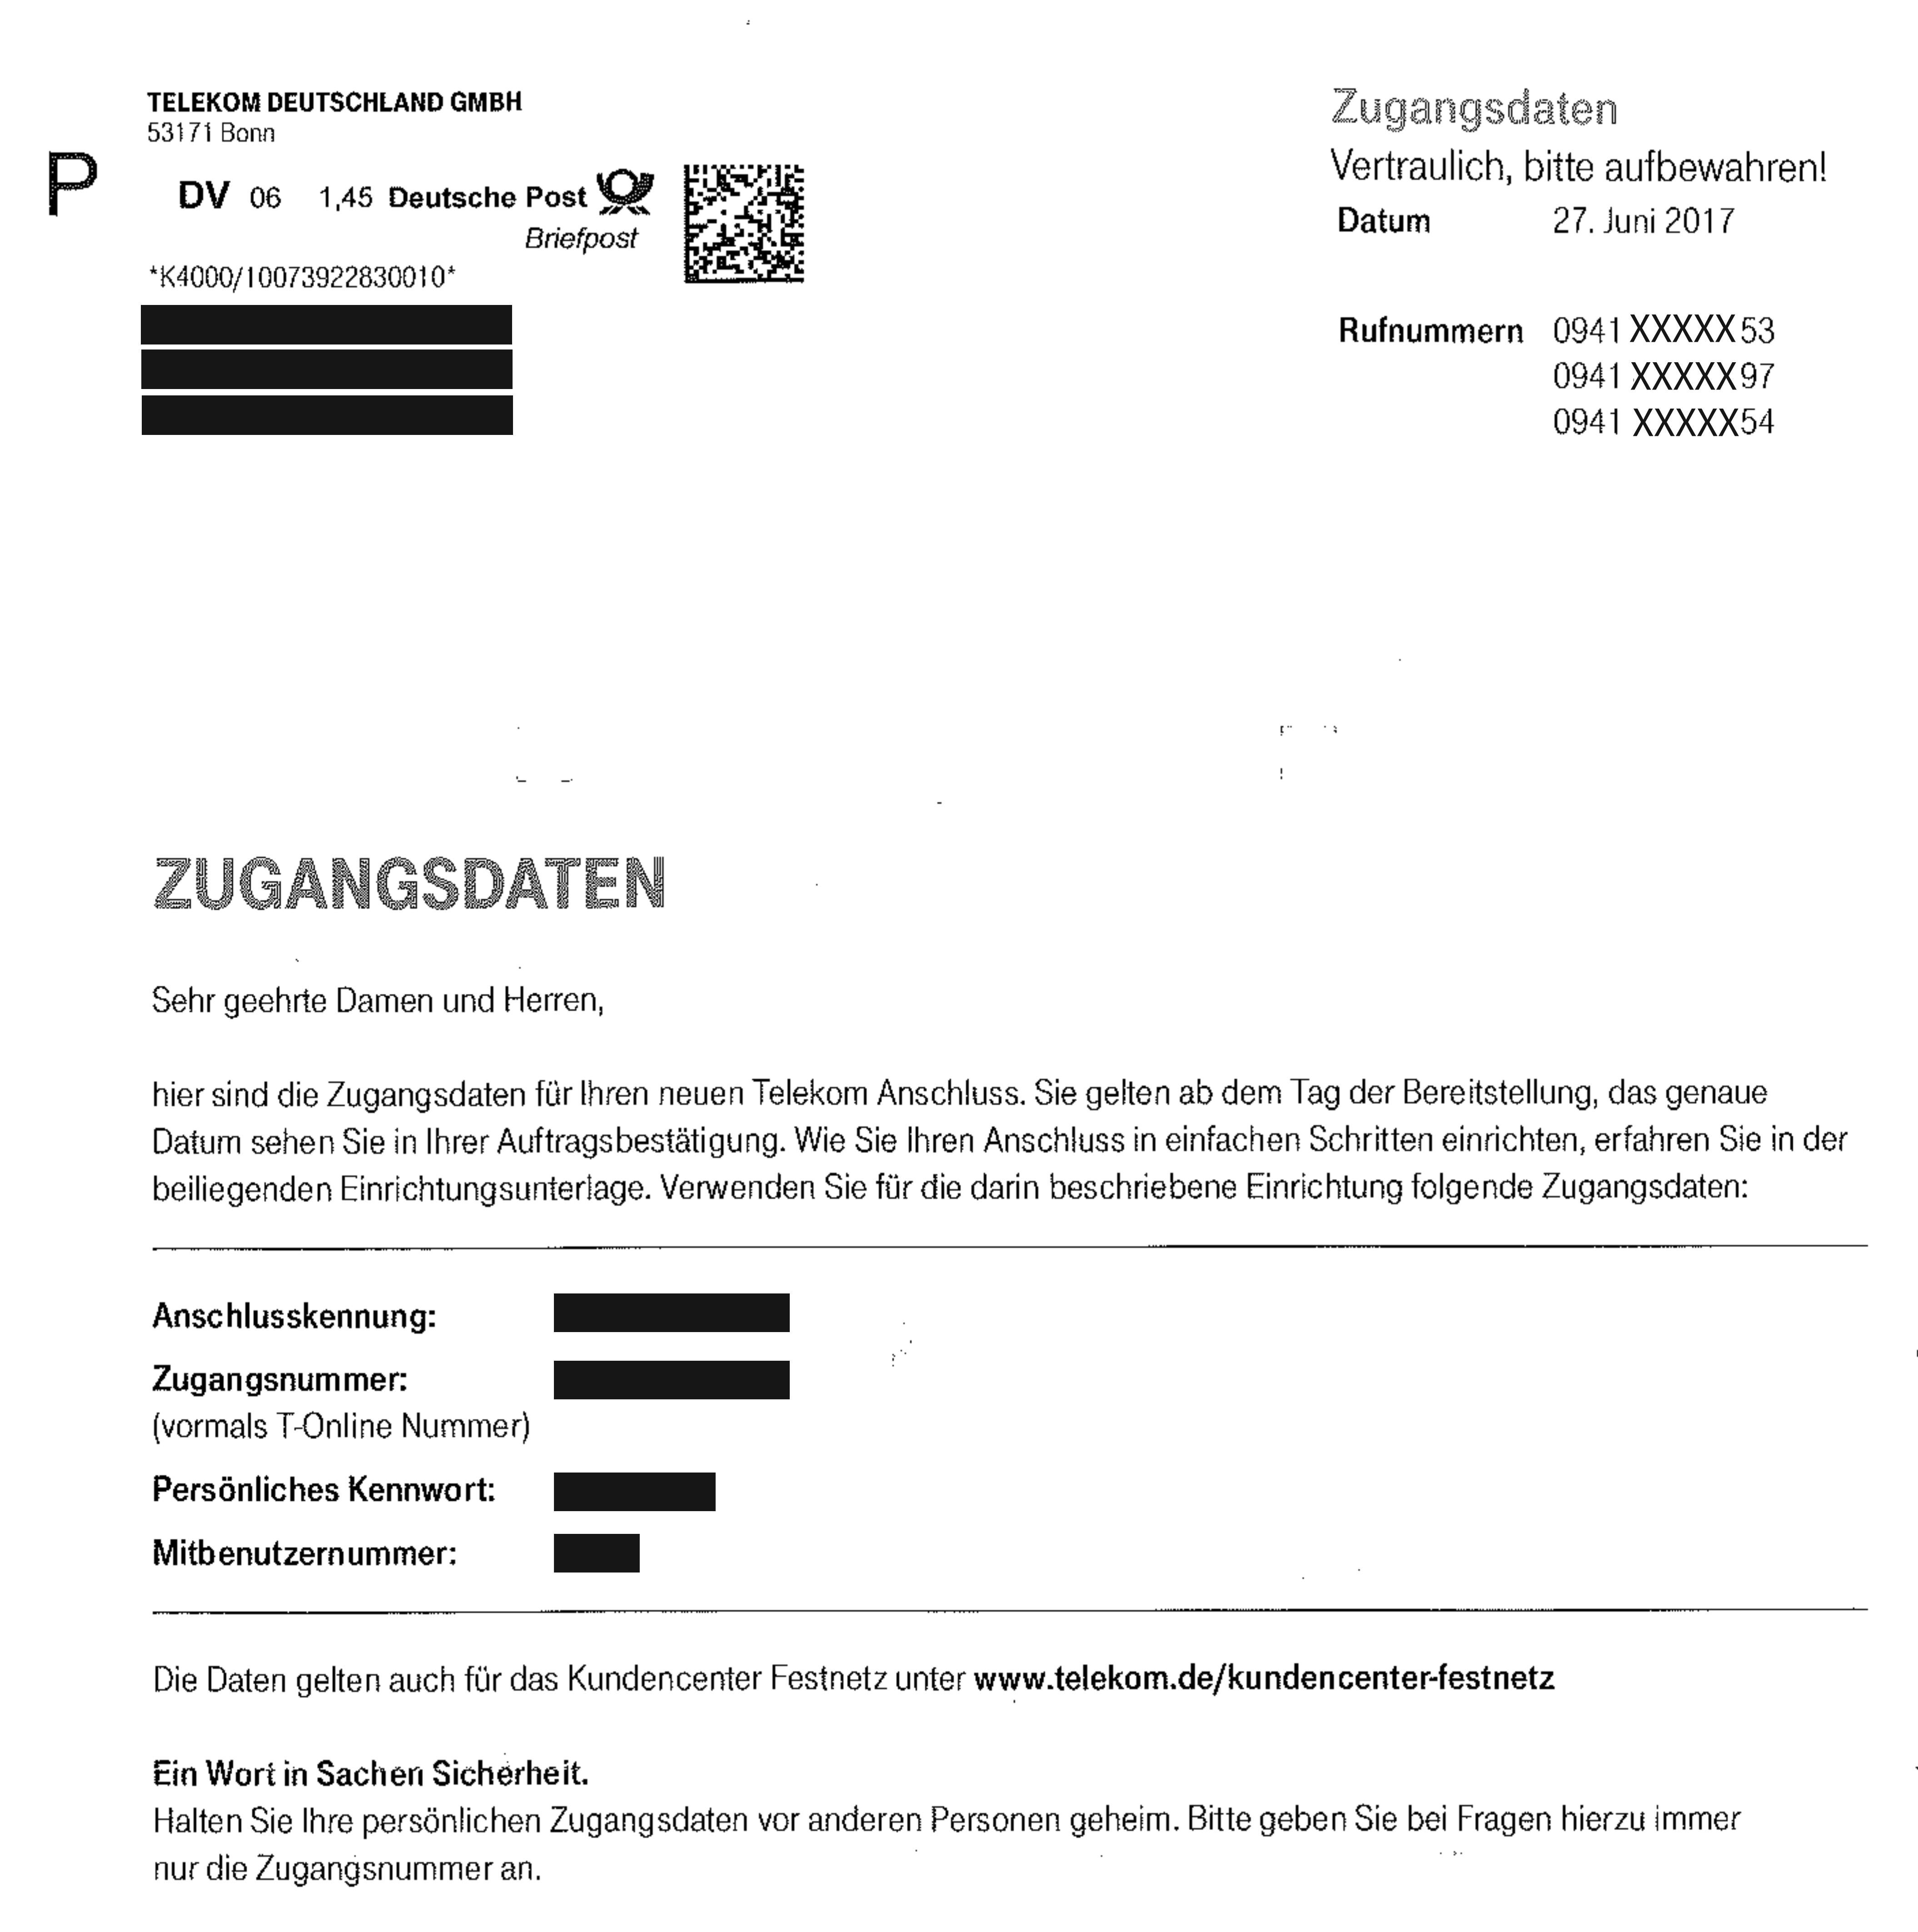 Deutsche Telekom Mehrgerate Anschluss